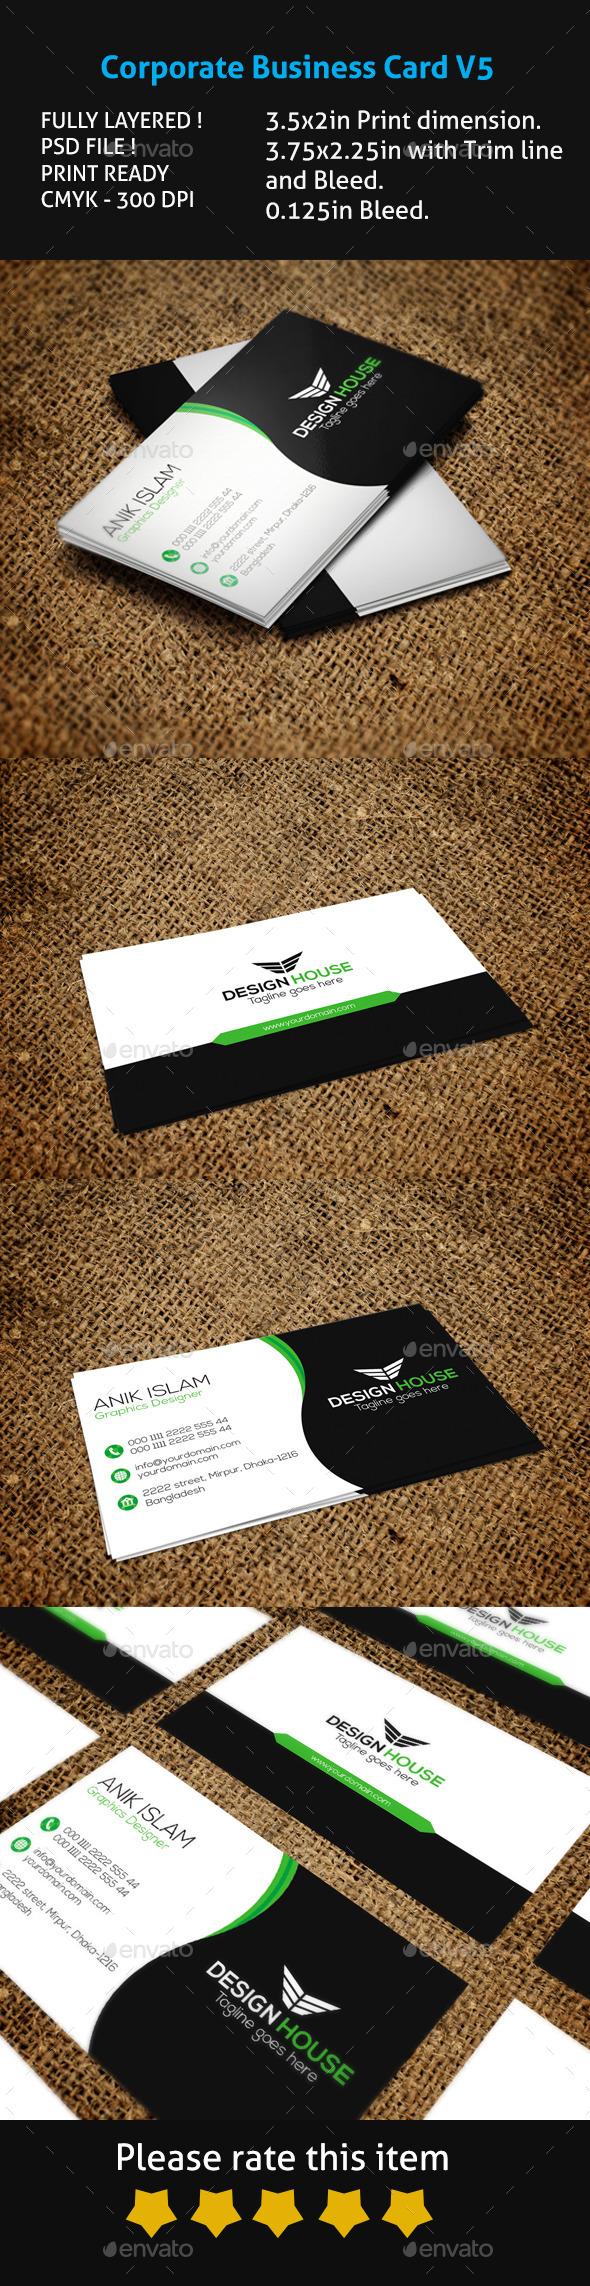 Corporate Business Card V5 - Corporate Business Cards